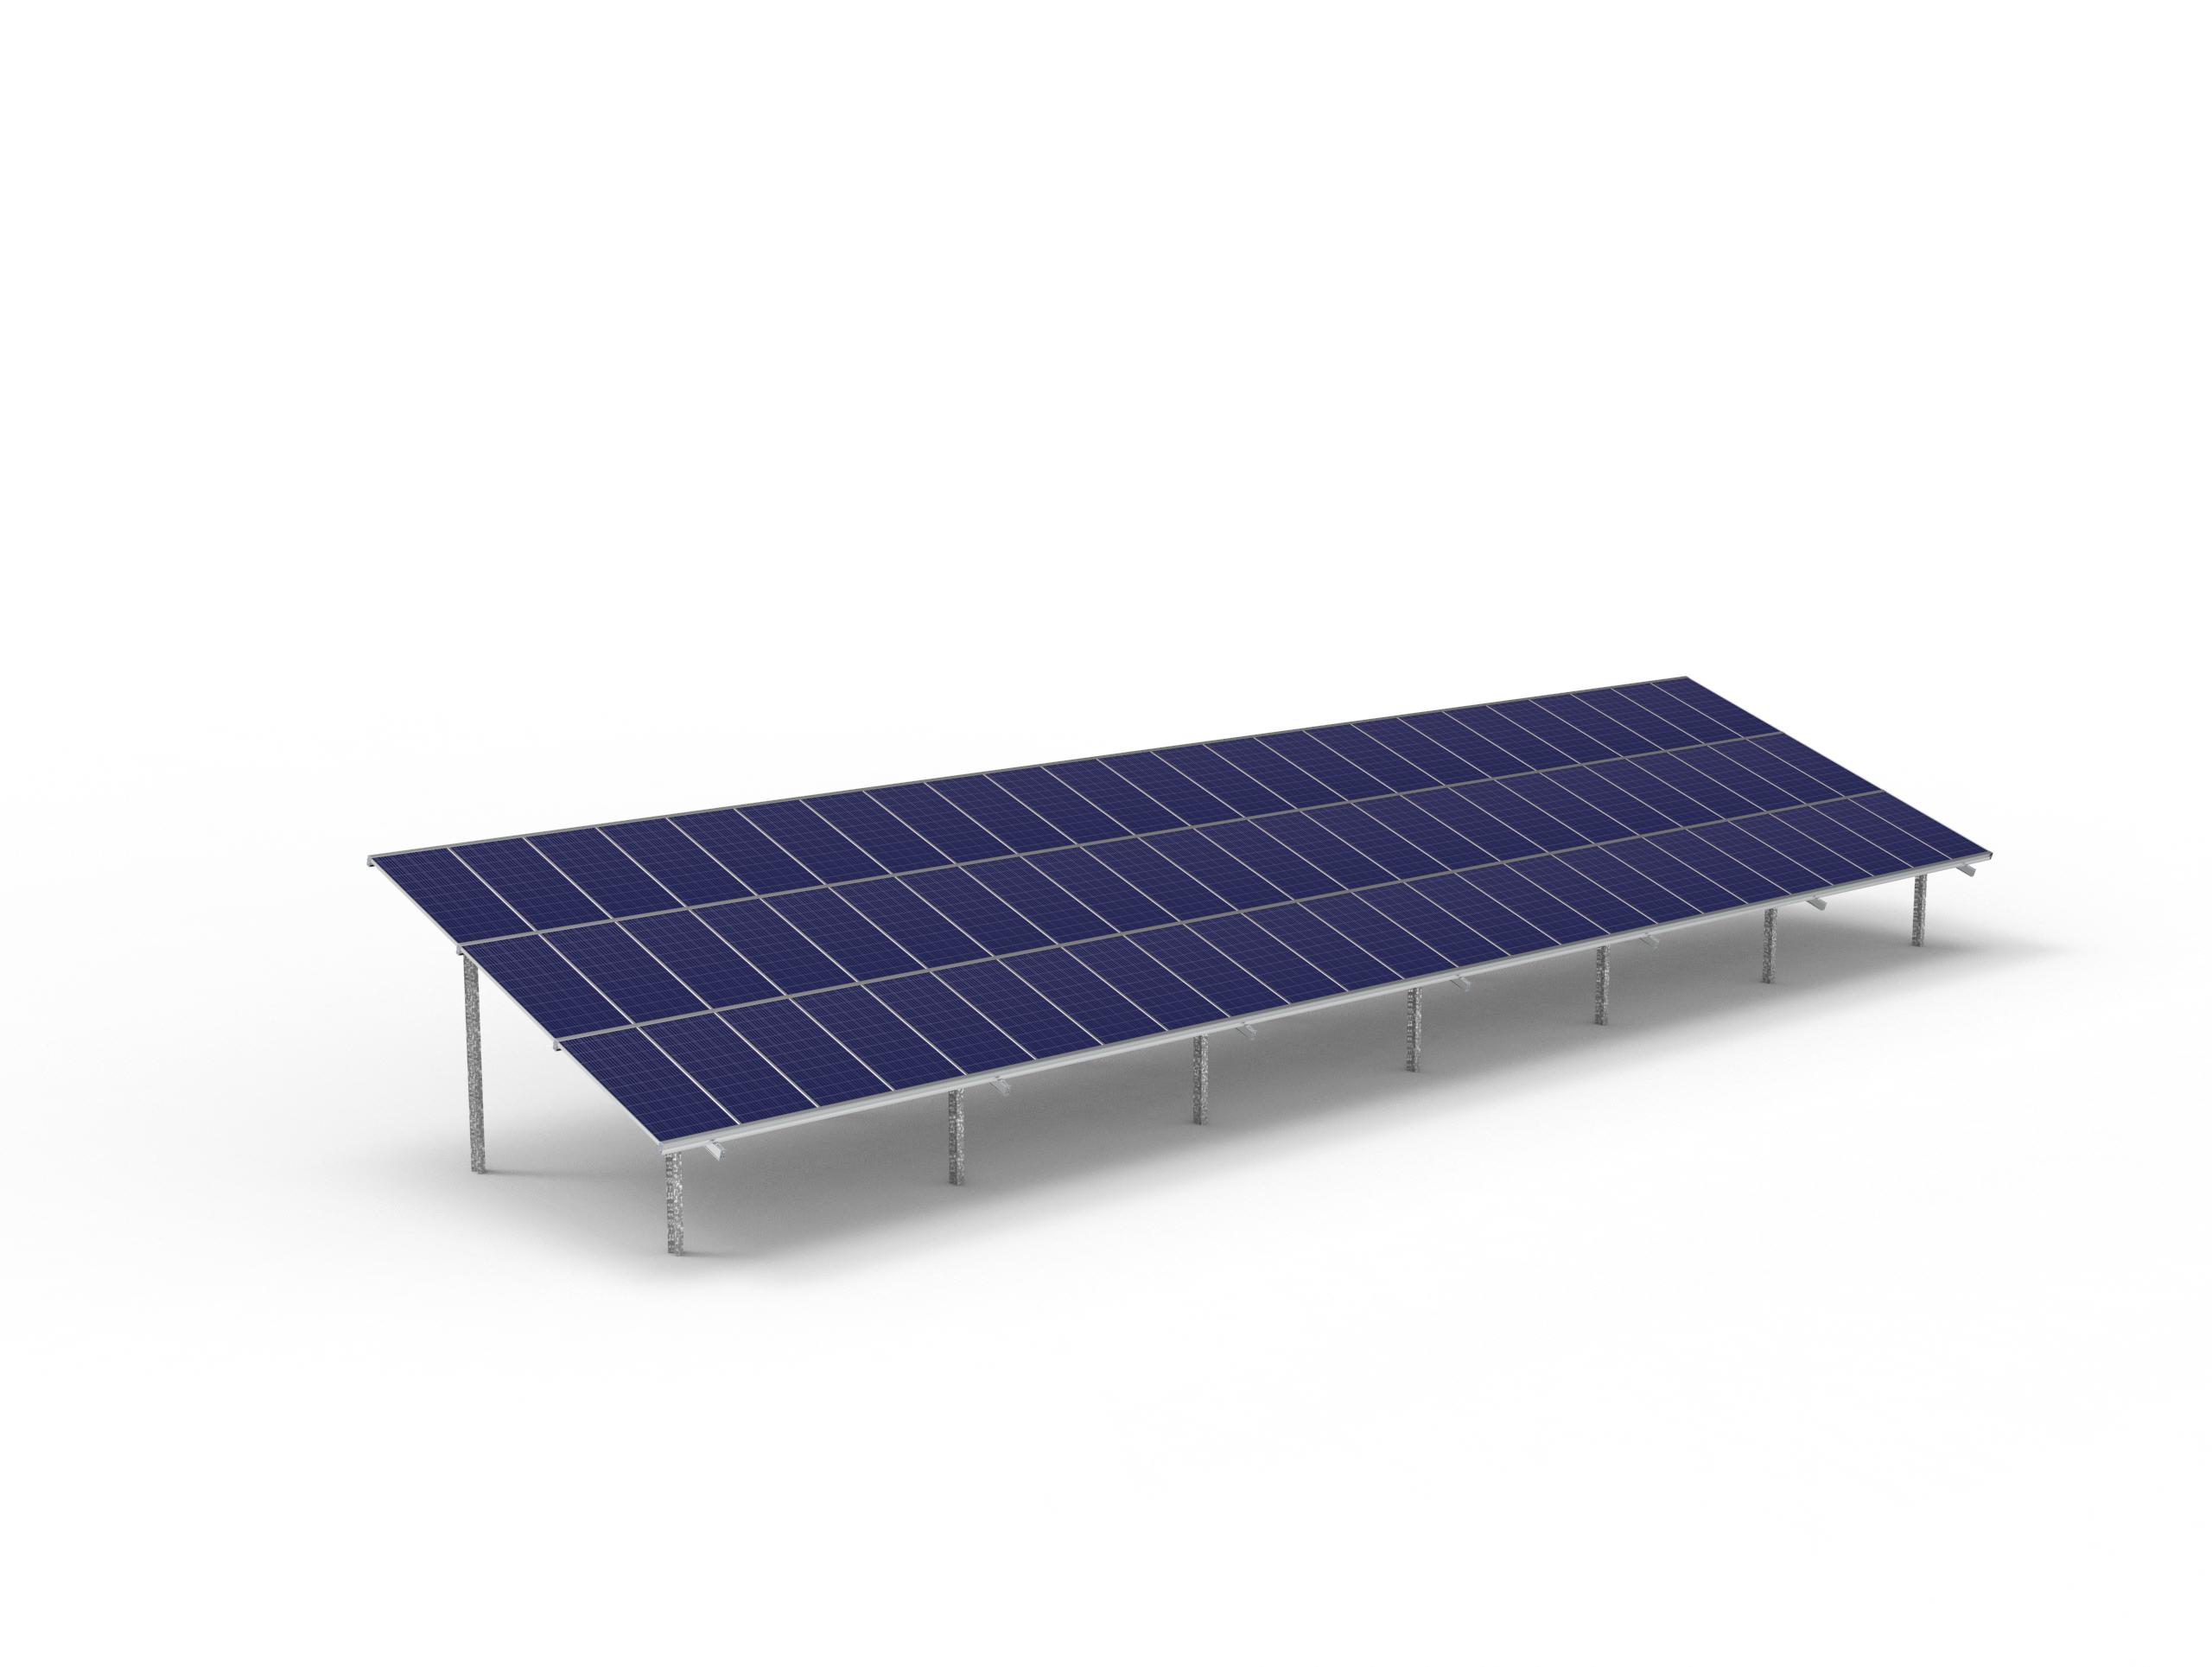 72 module Max solar ground mount table